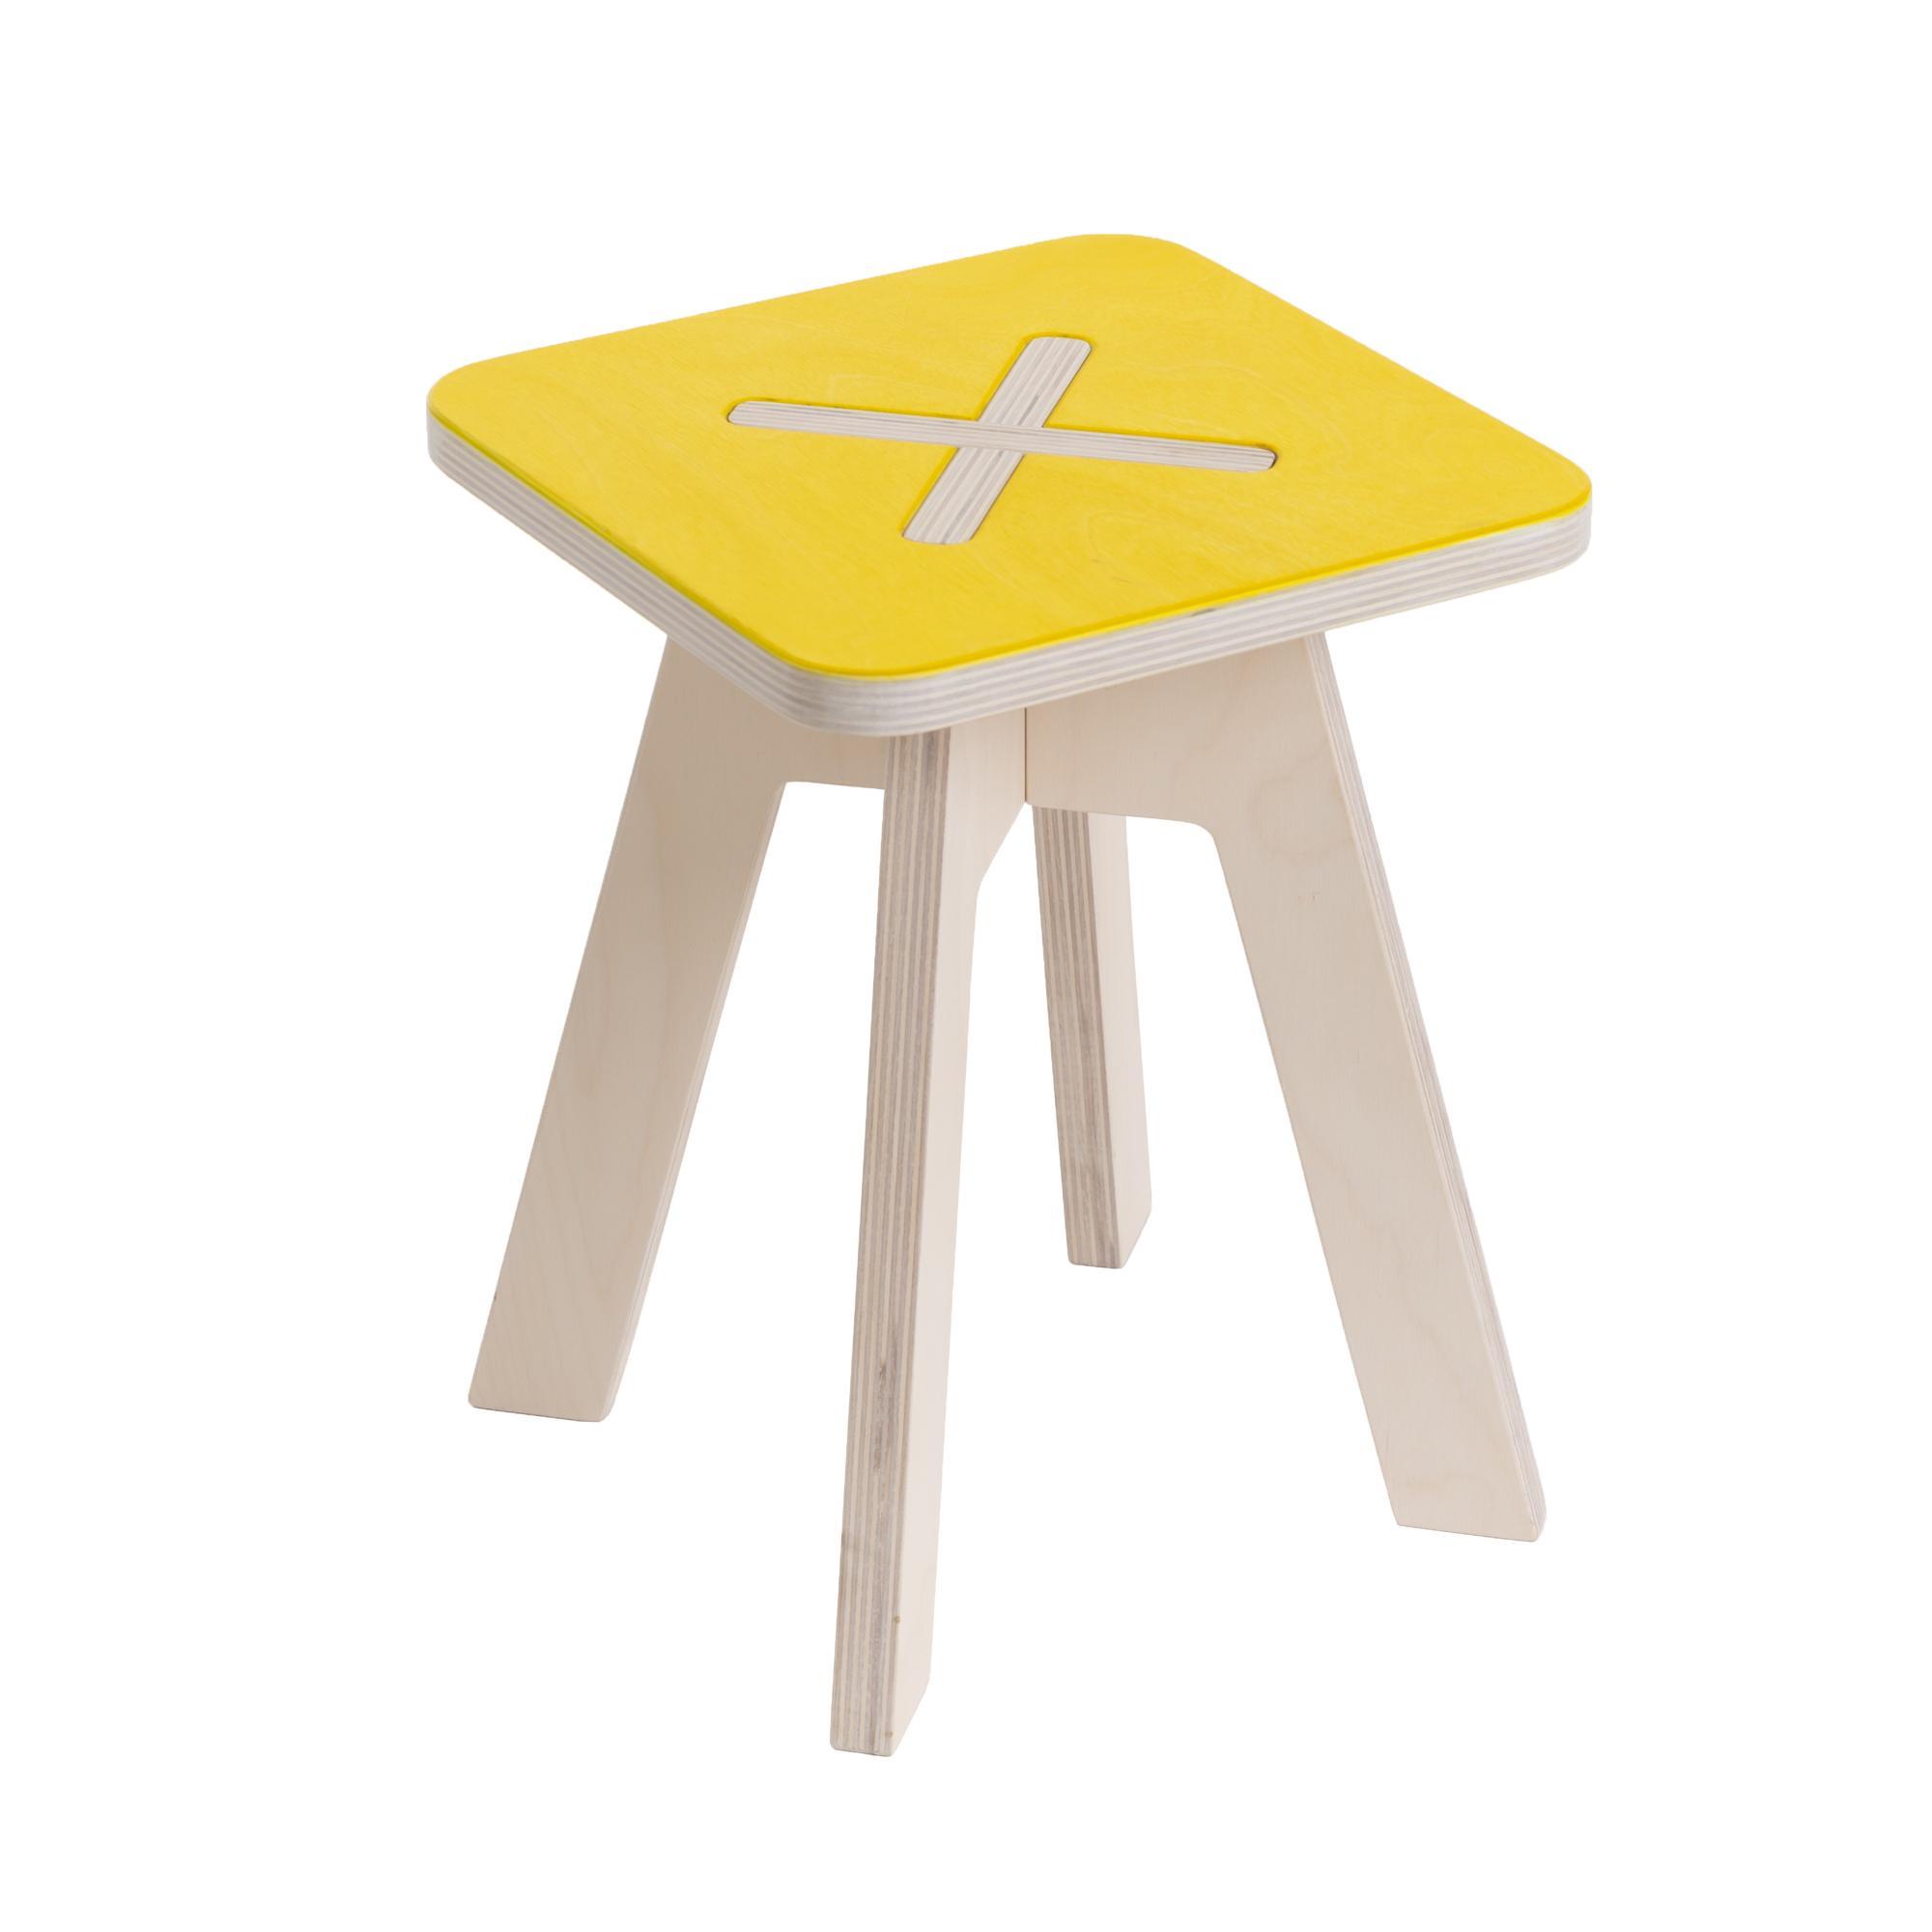 Design kinderstuhl fabulous natur massivholz holz baby sitzen design massivholz kinderstuhl t - Kinderstuhl design ...